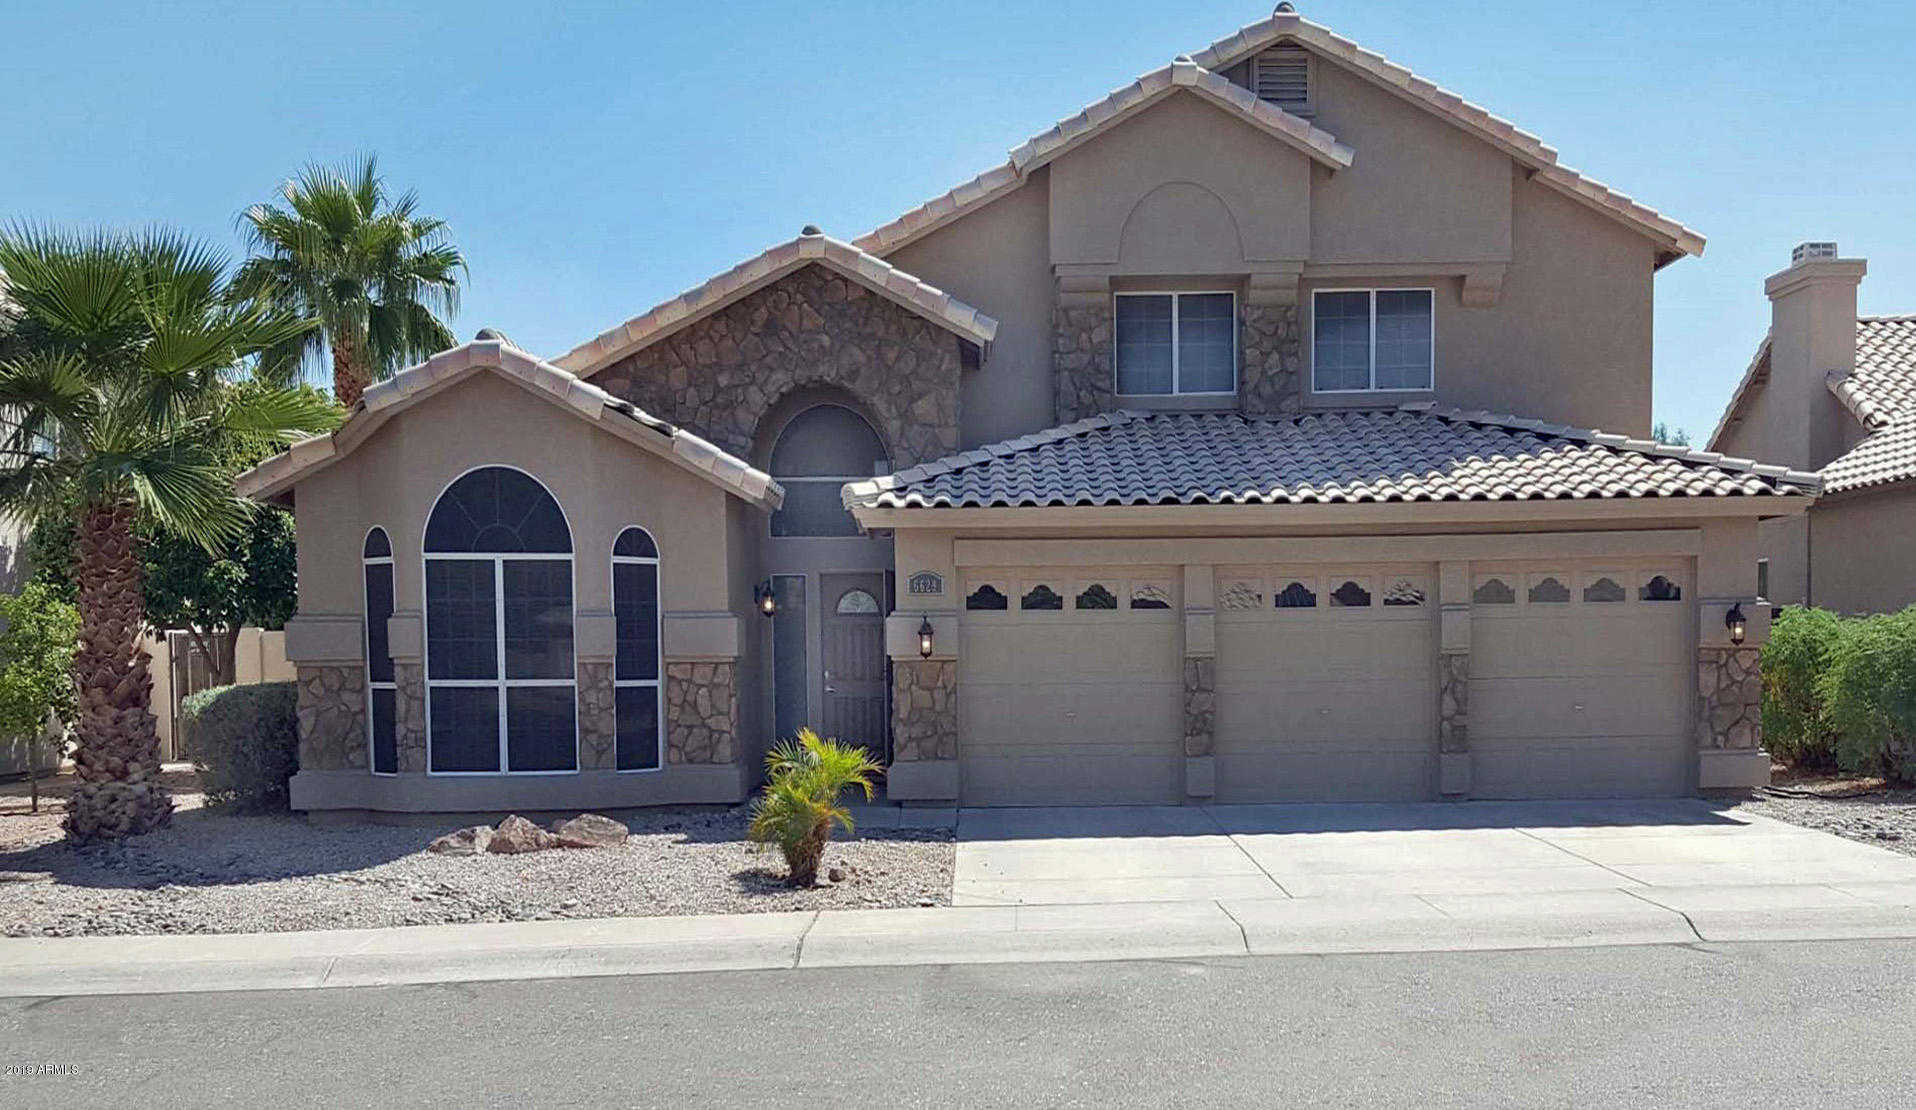 $409,900 - 4Br/3Ba - Home for Sale in Hamilton Arrowhead Ranch 5, Glendale